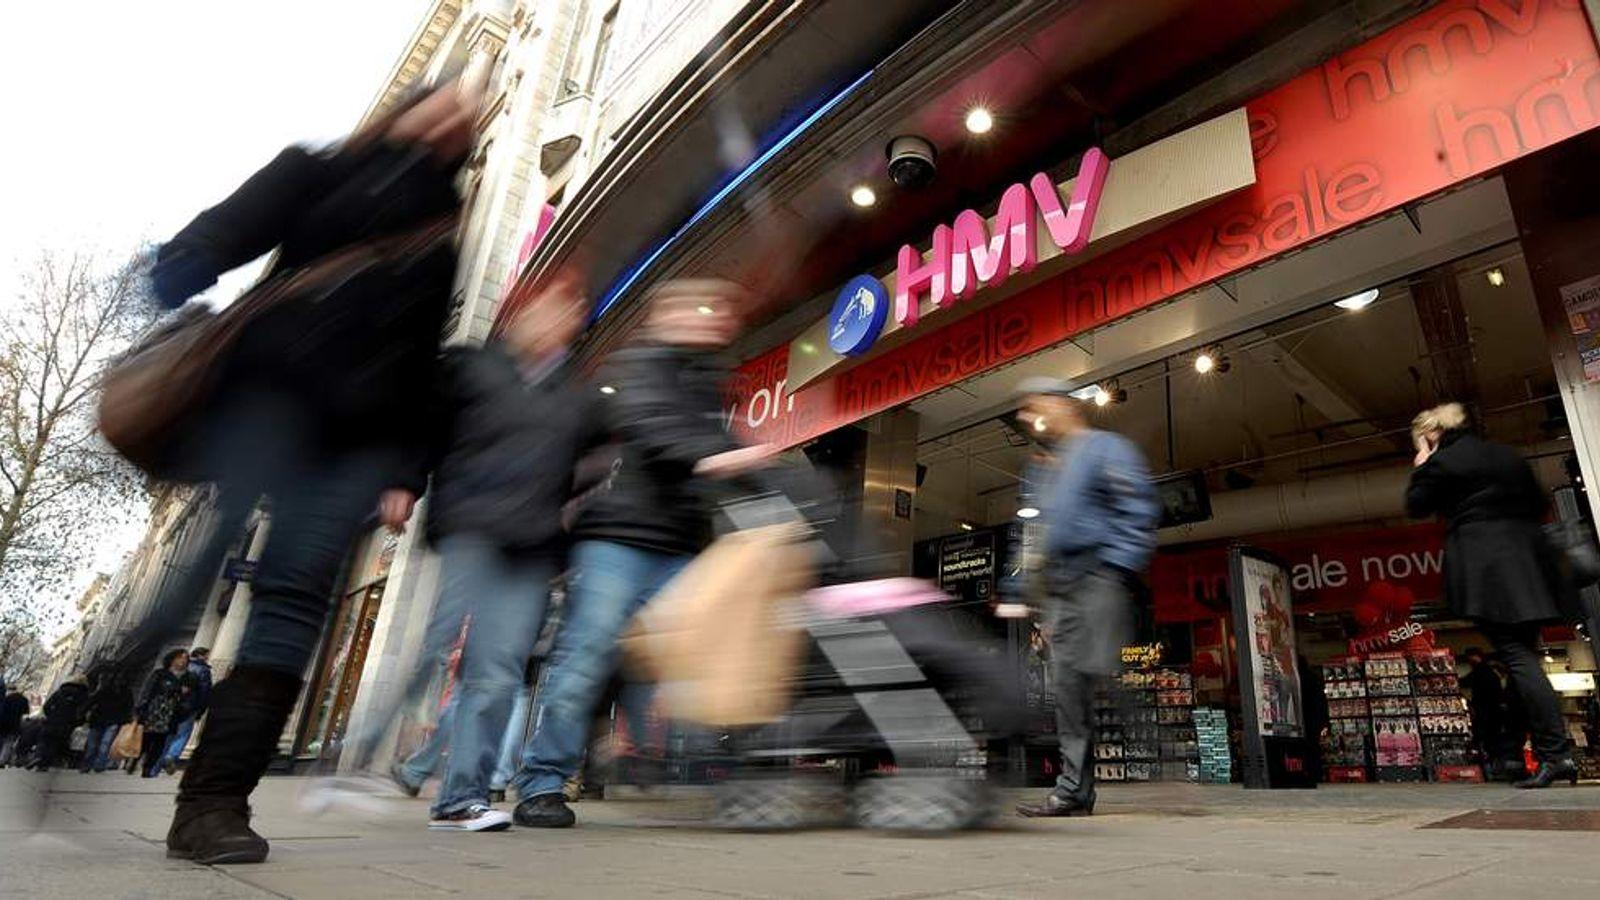 HMV store on Oxford Street